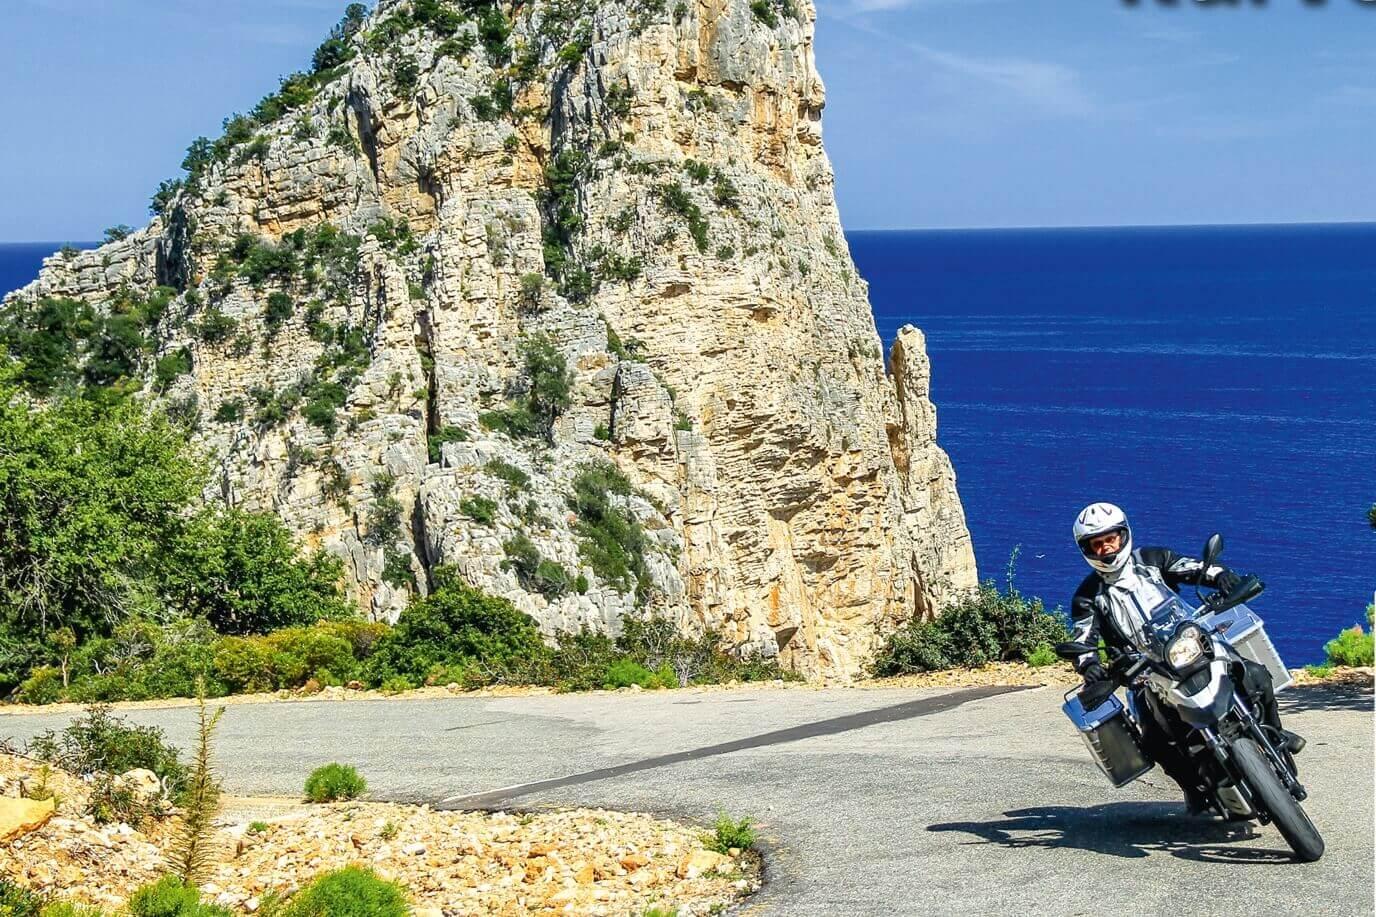 hotel-per-motociclisti-sardegna-sardinien-bikers-hotel